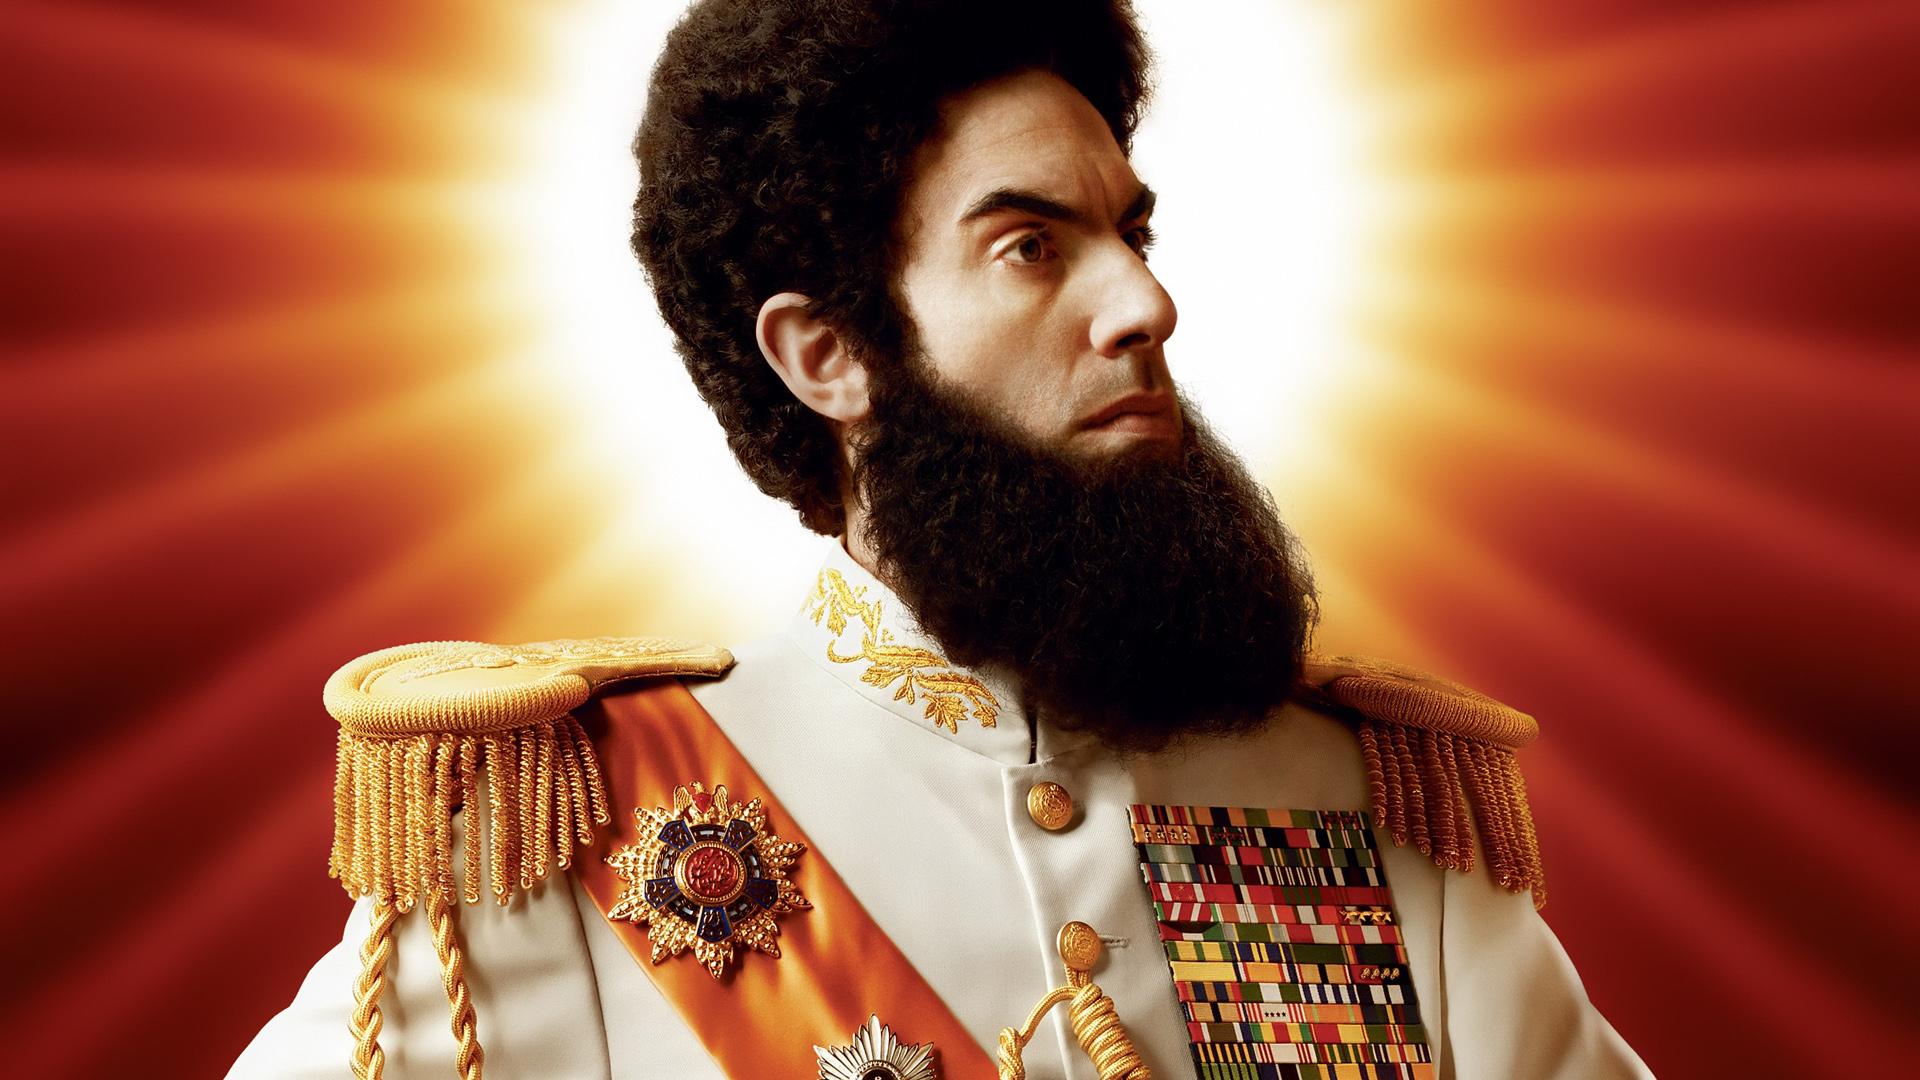 The Dictator 2012 Royal Portrait Collection, Sacha Baron Cohen ...